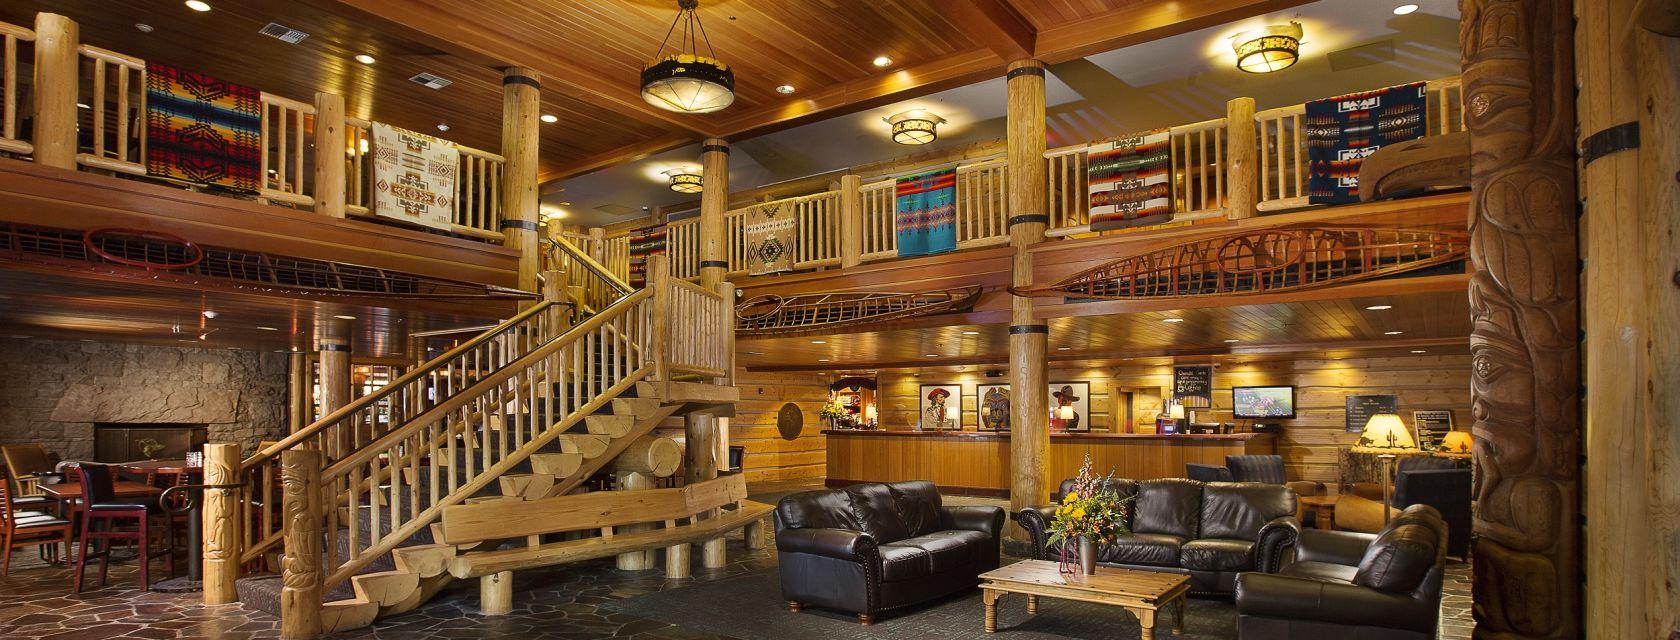 Hotels in Vancouver WA | The Heathman Lodge